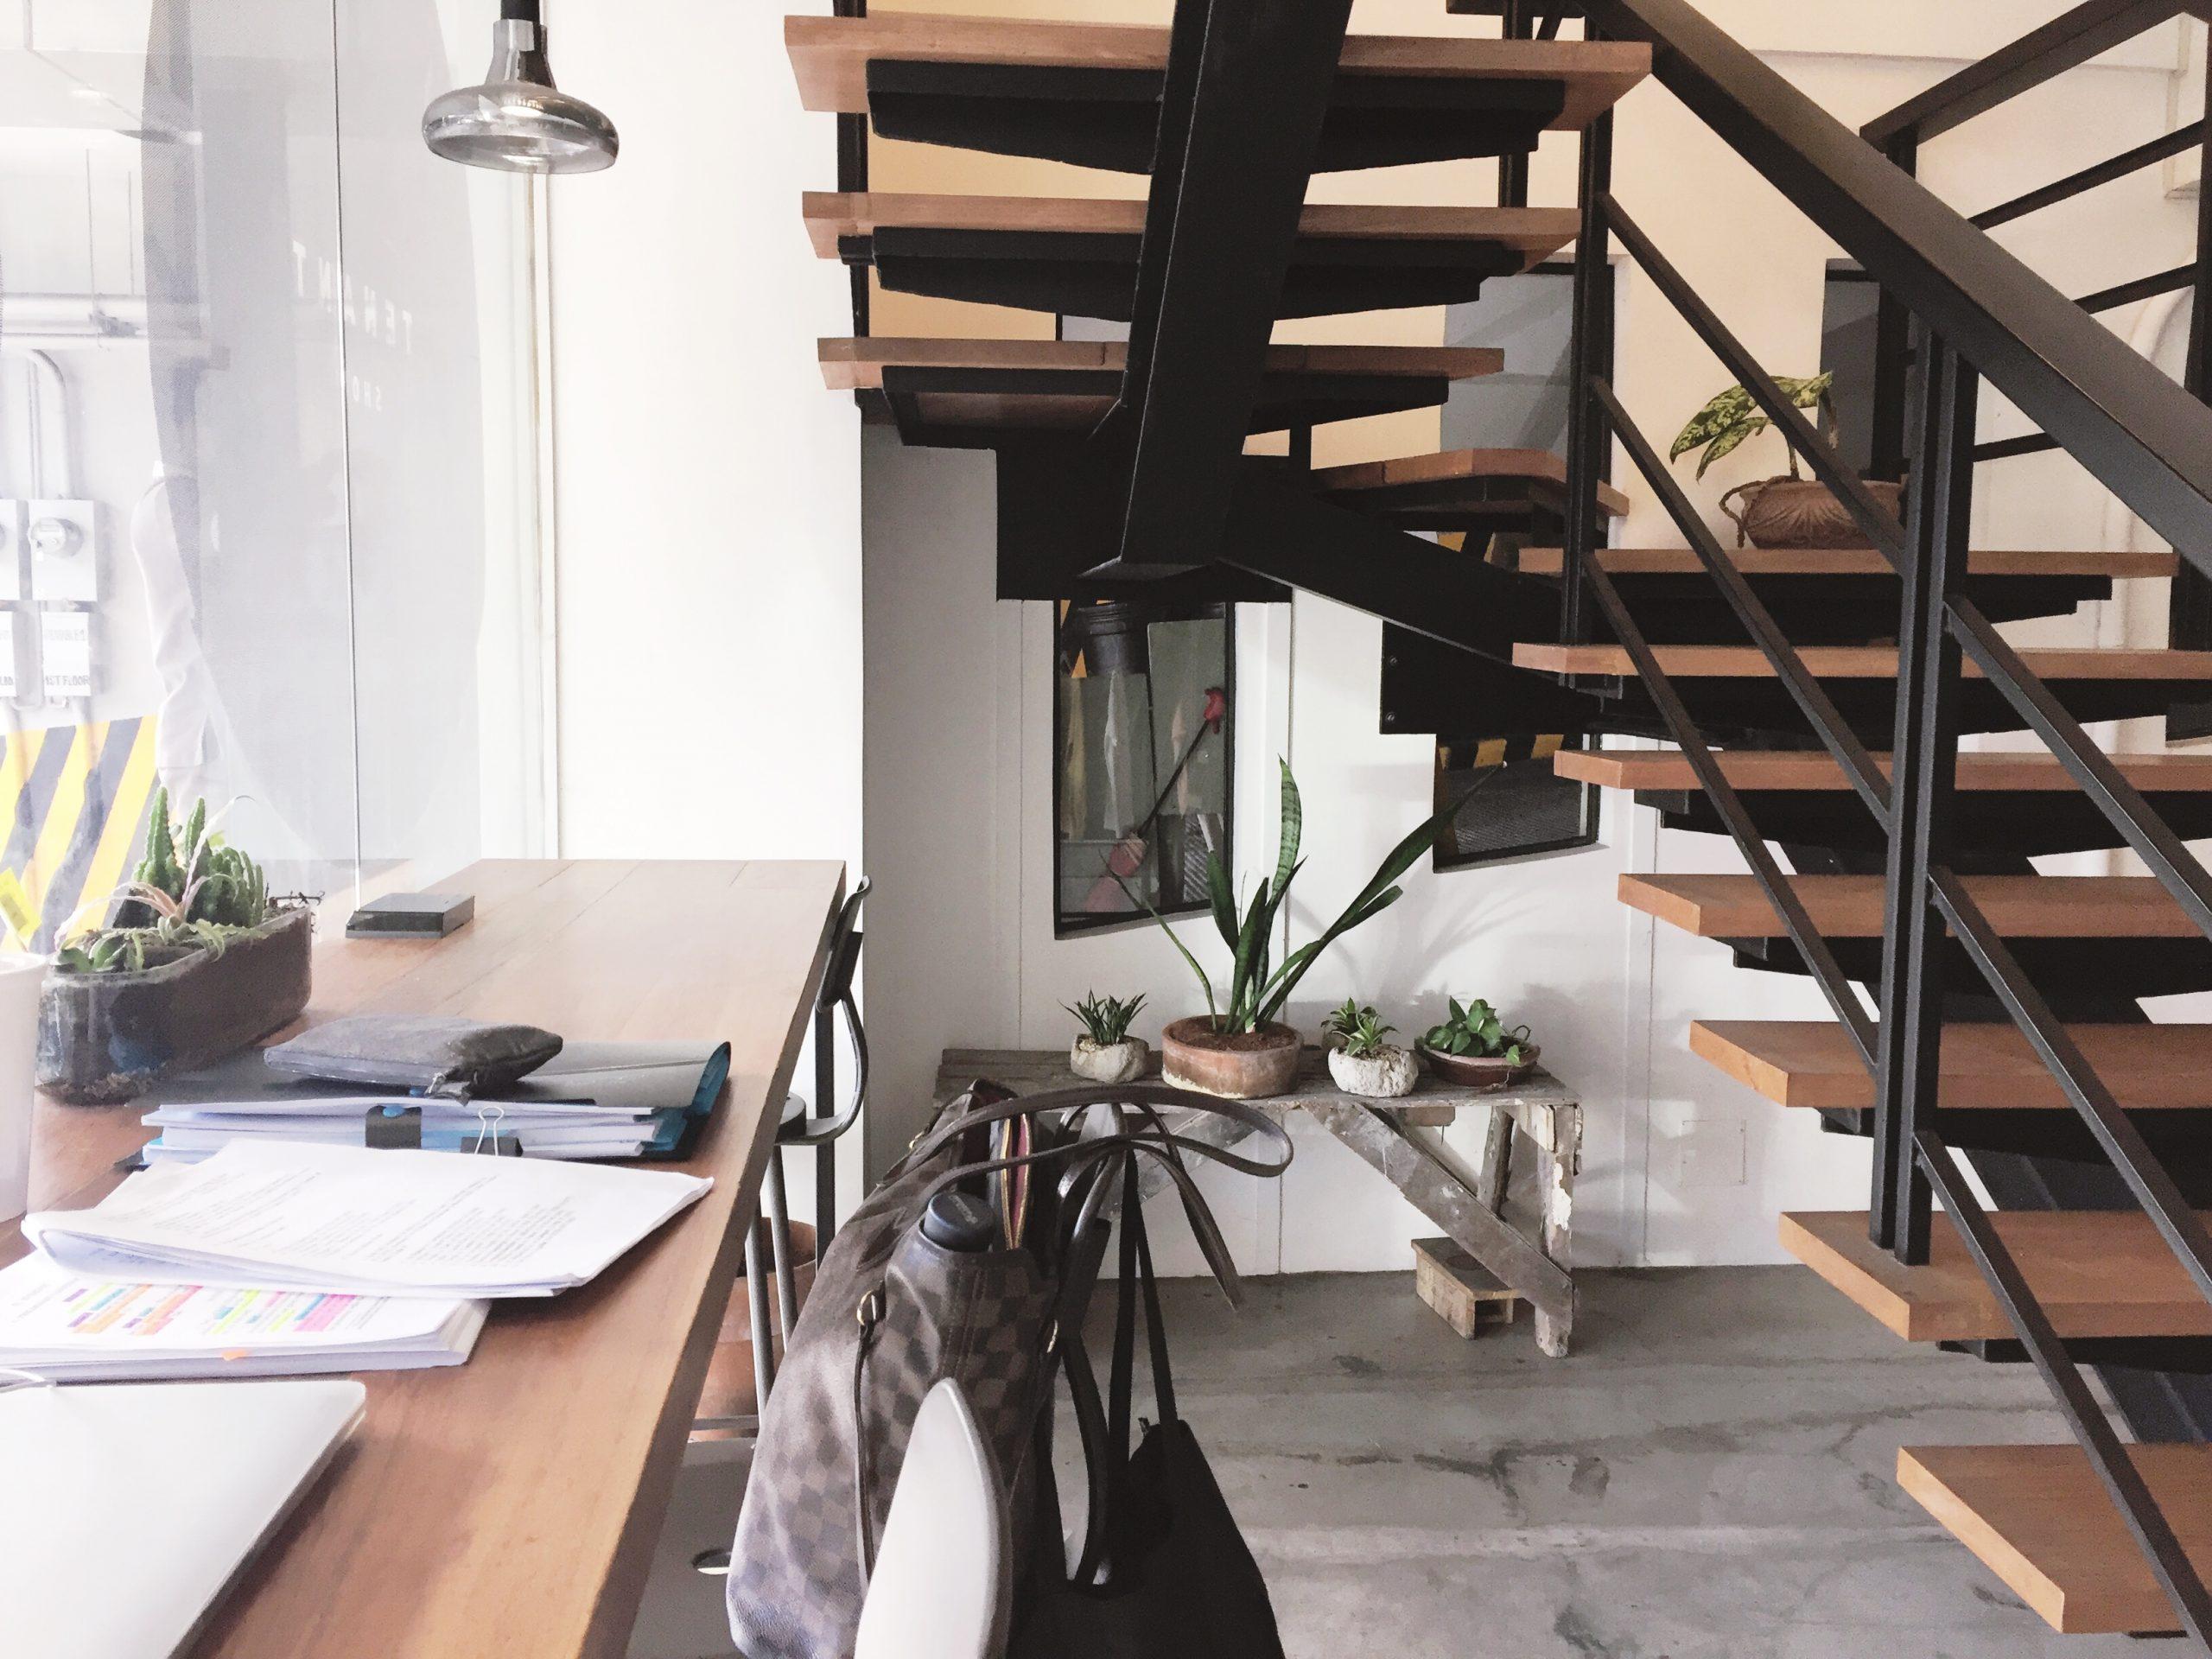 tenant-manila-coffeehan (5)